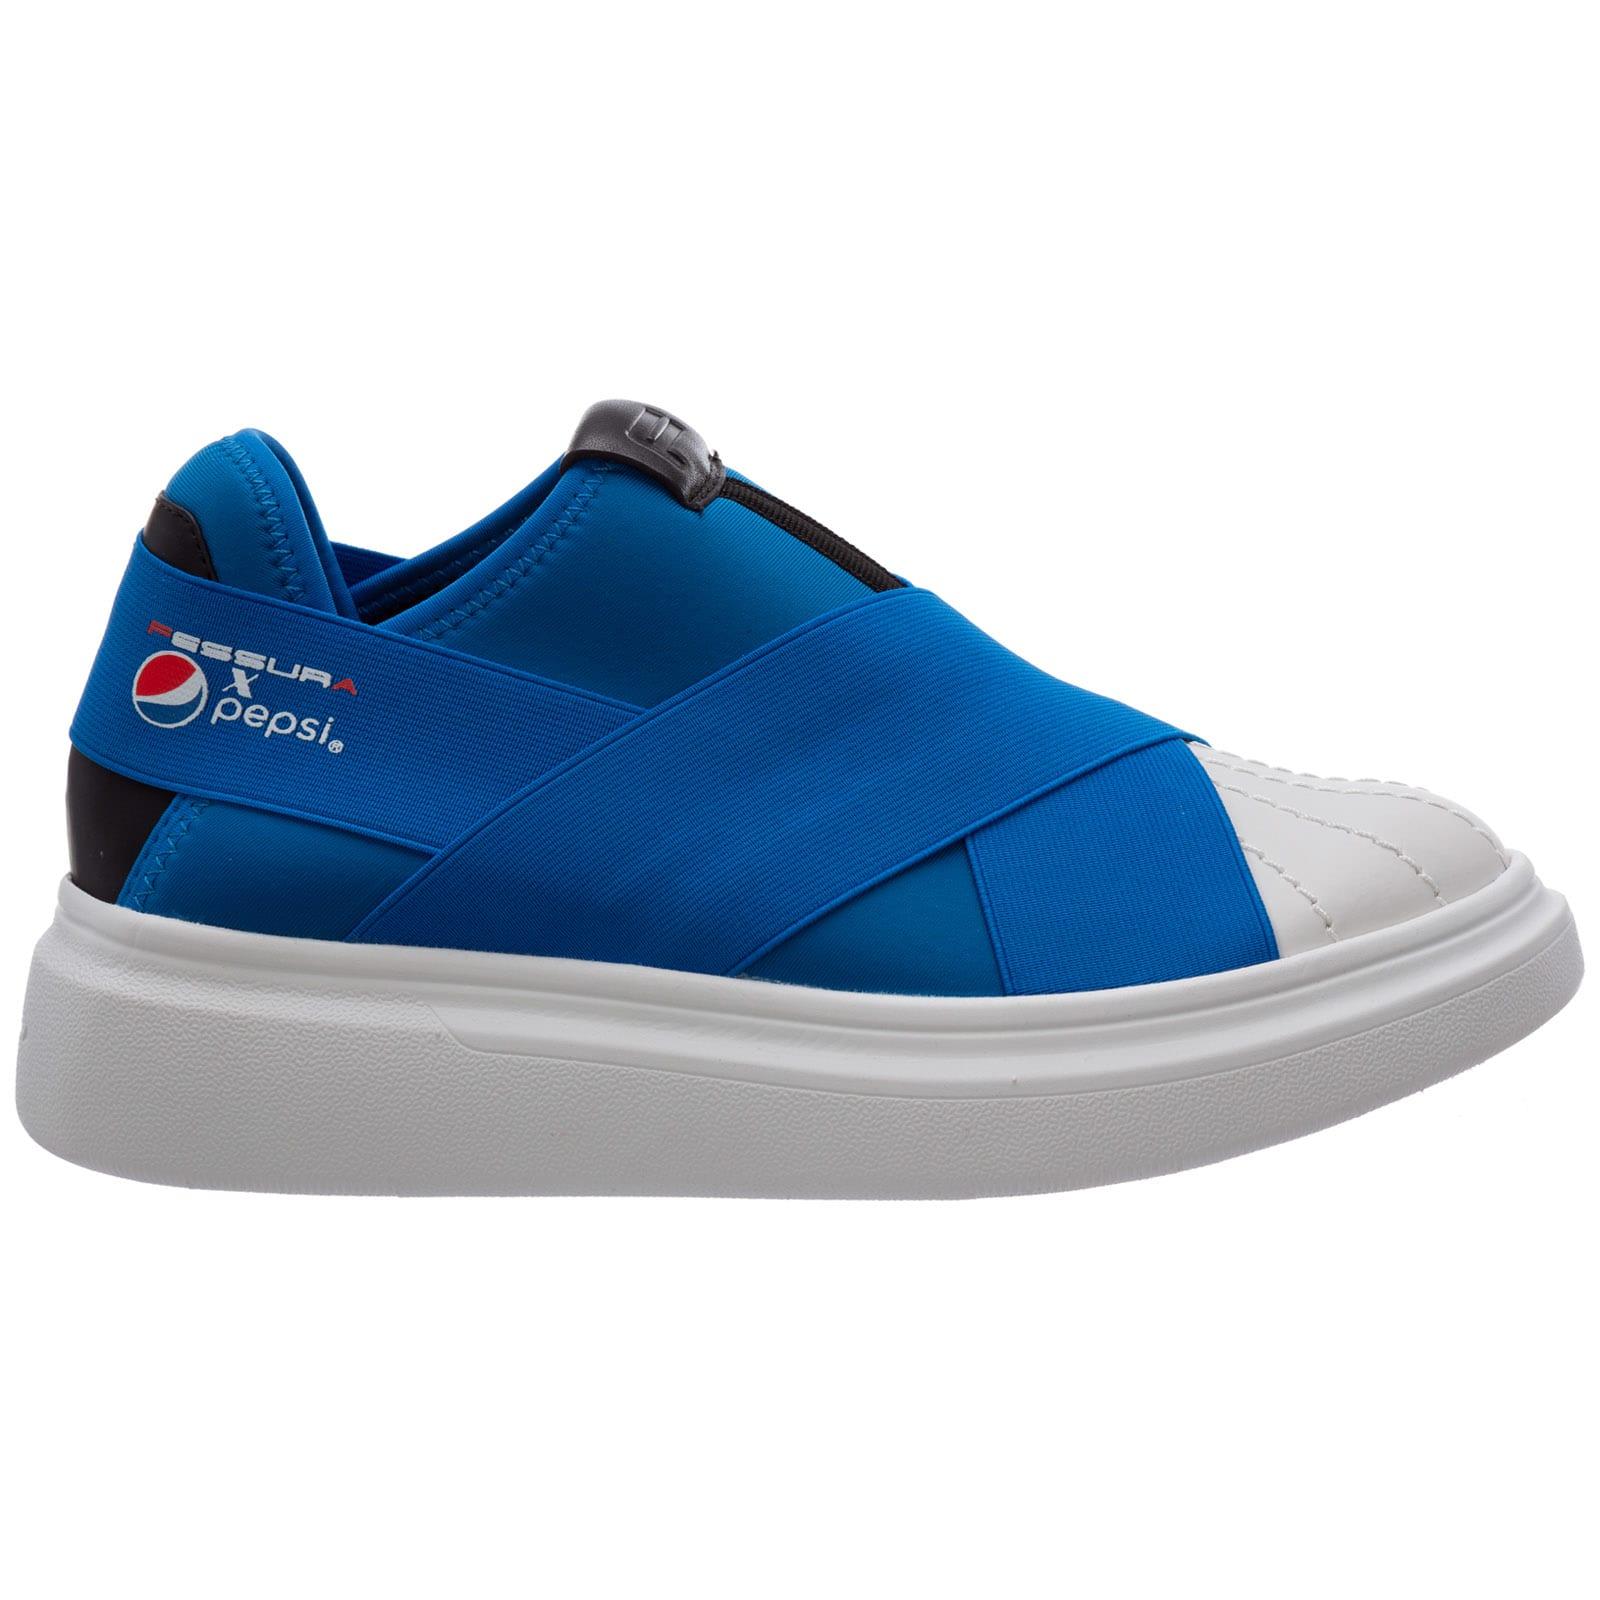 X Pepsi Edge Slip-on Shoes